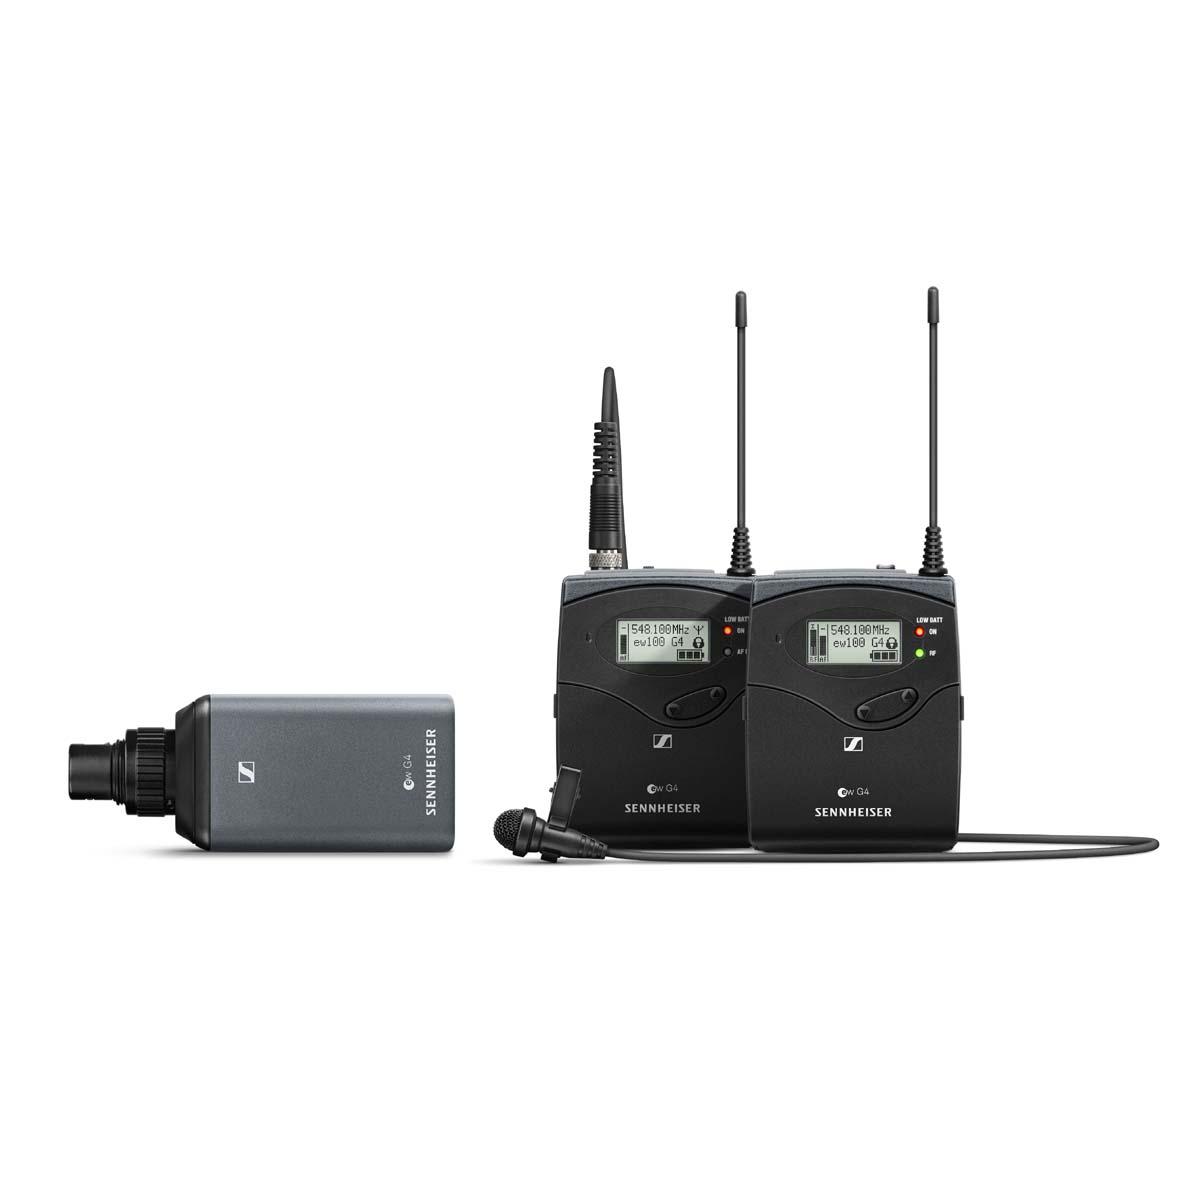 Sennheiser Ew100 Eng G4 Gb Wireless Eng System